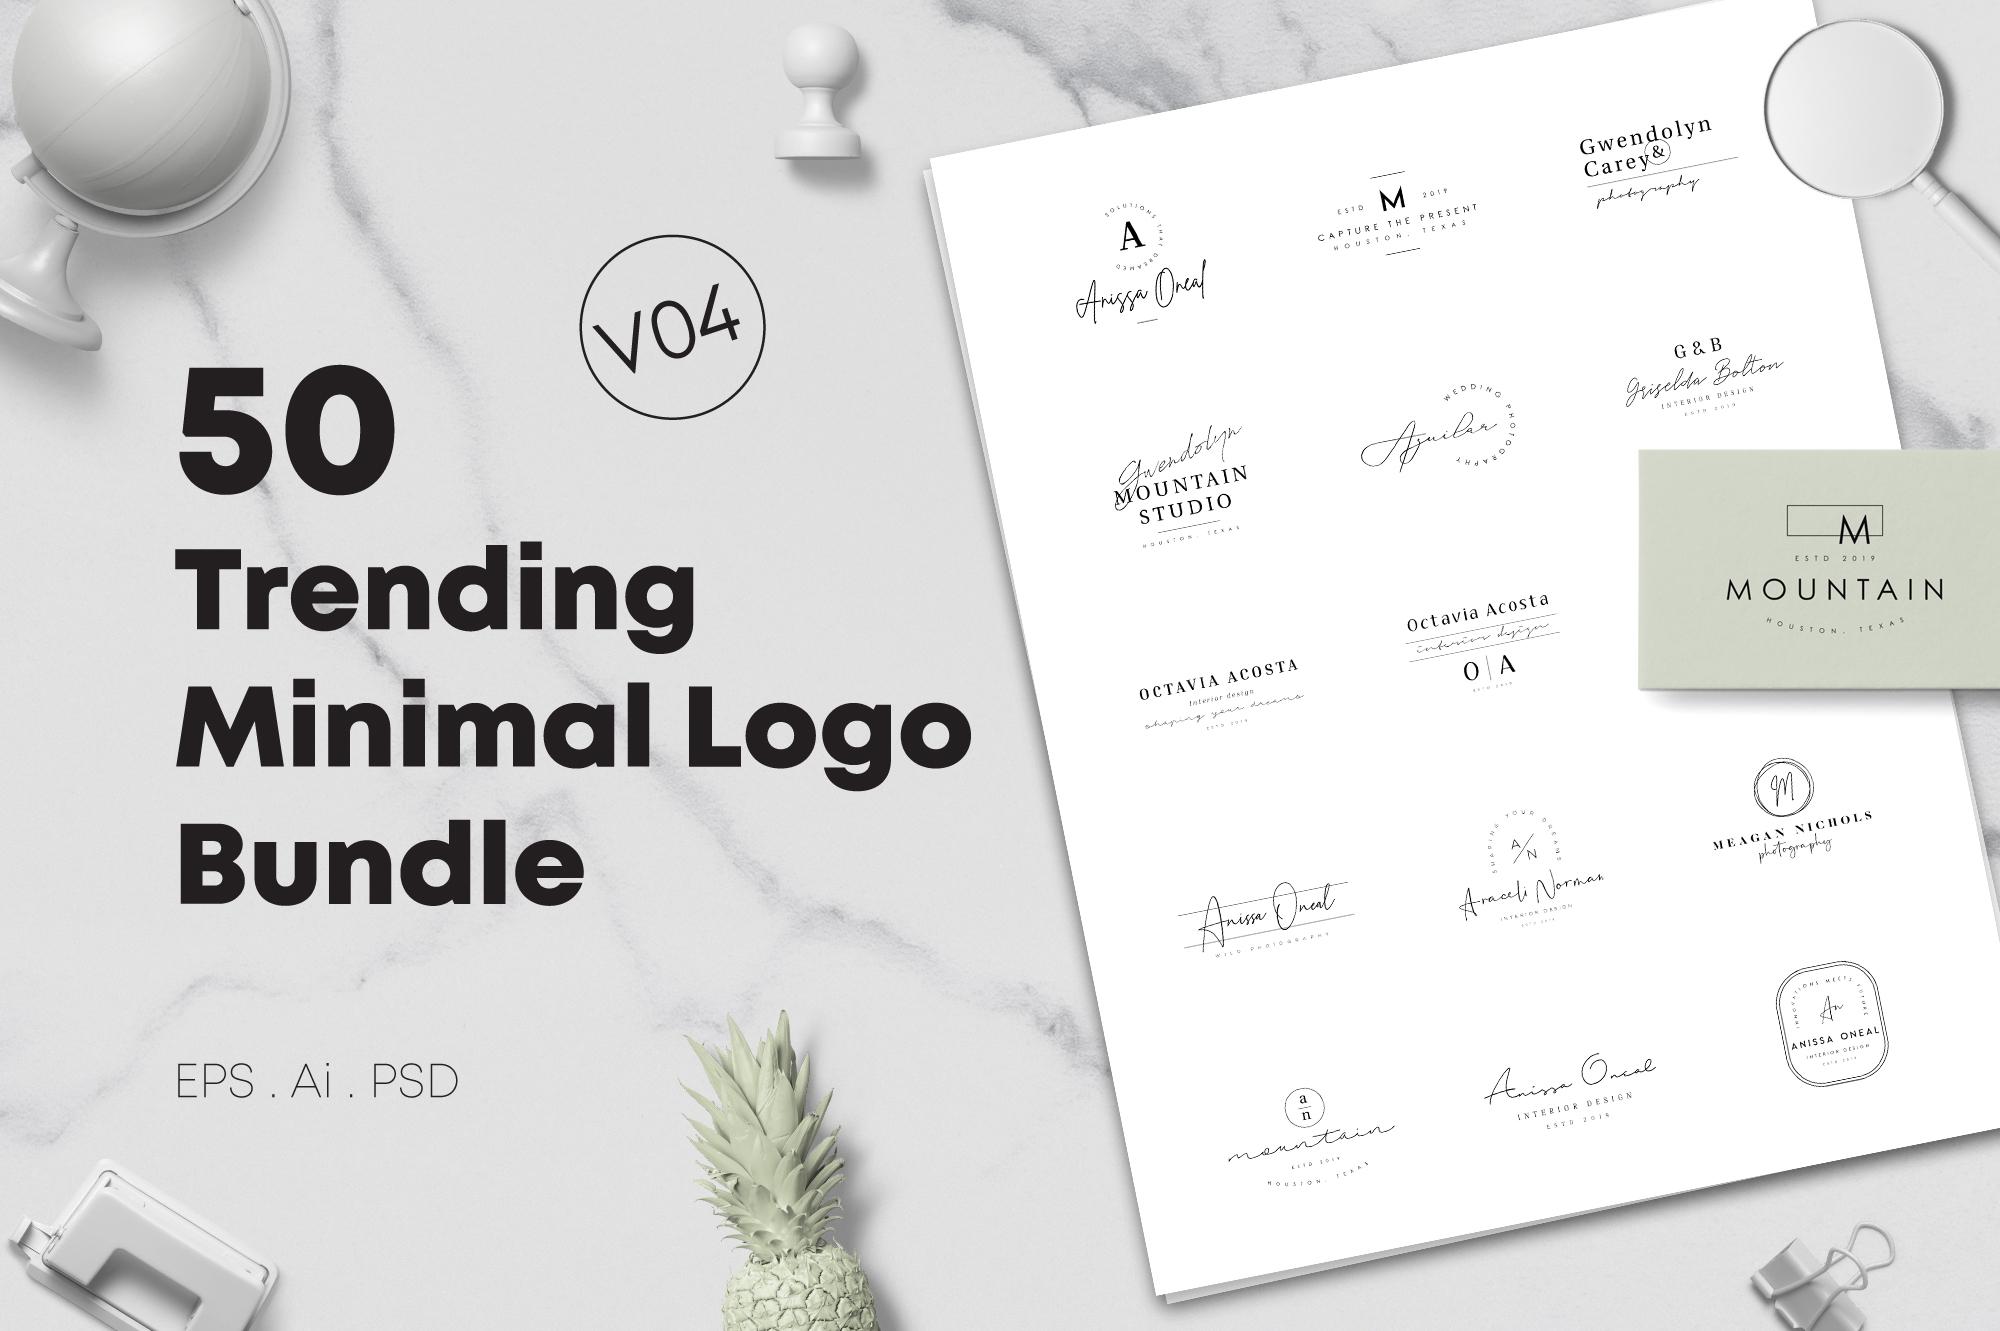 200 Trending Minimal Logo Bundle example image 21